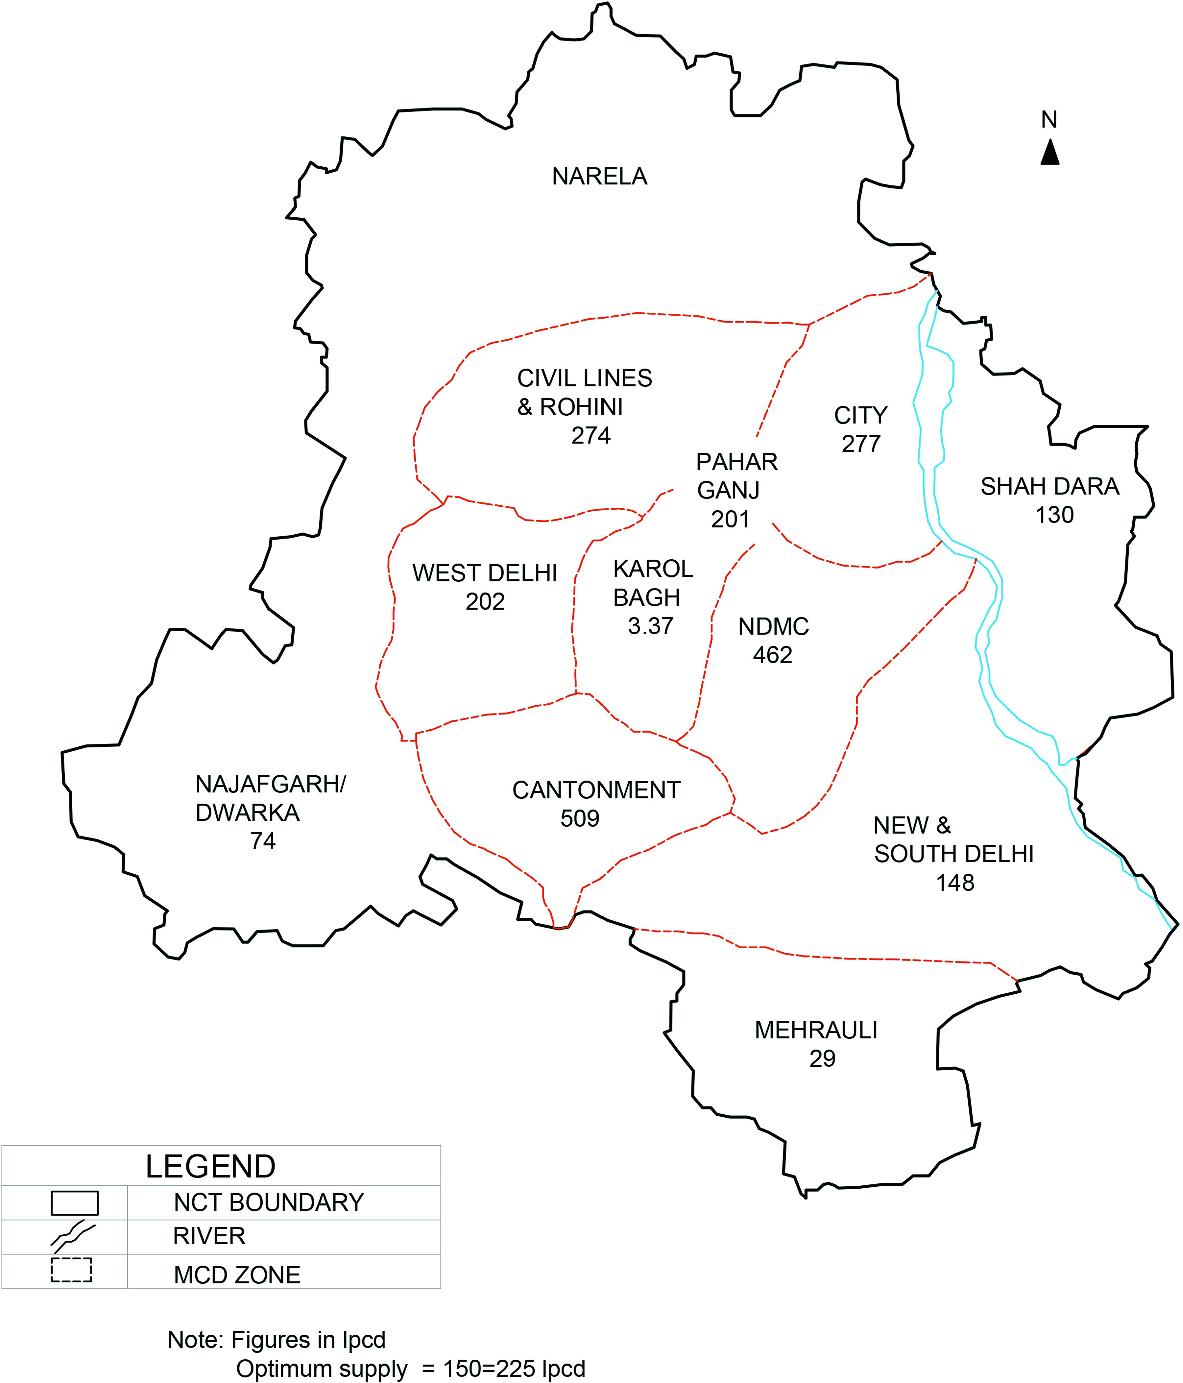 Visualizing Environmental Impact of Smart New Delhi